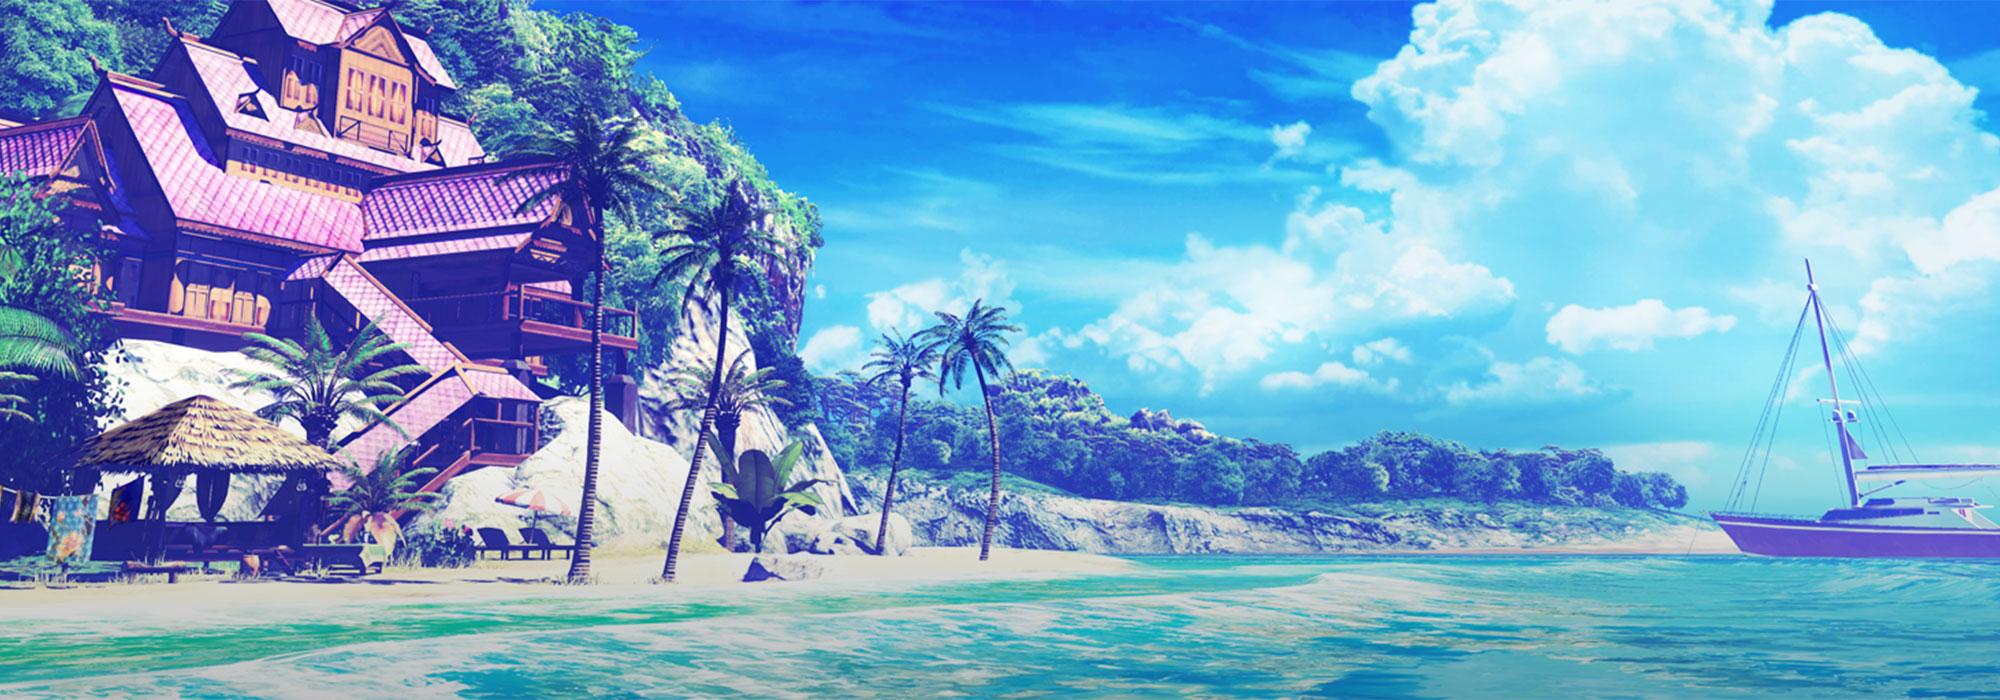 Kanzuki Beach